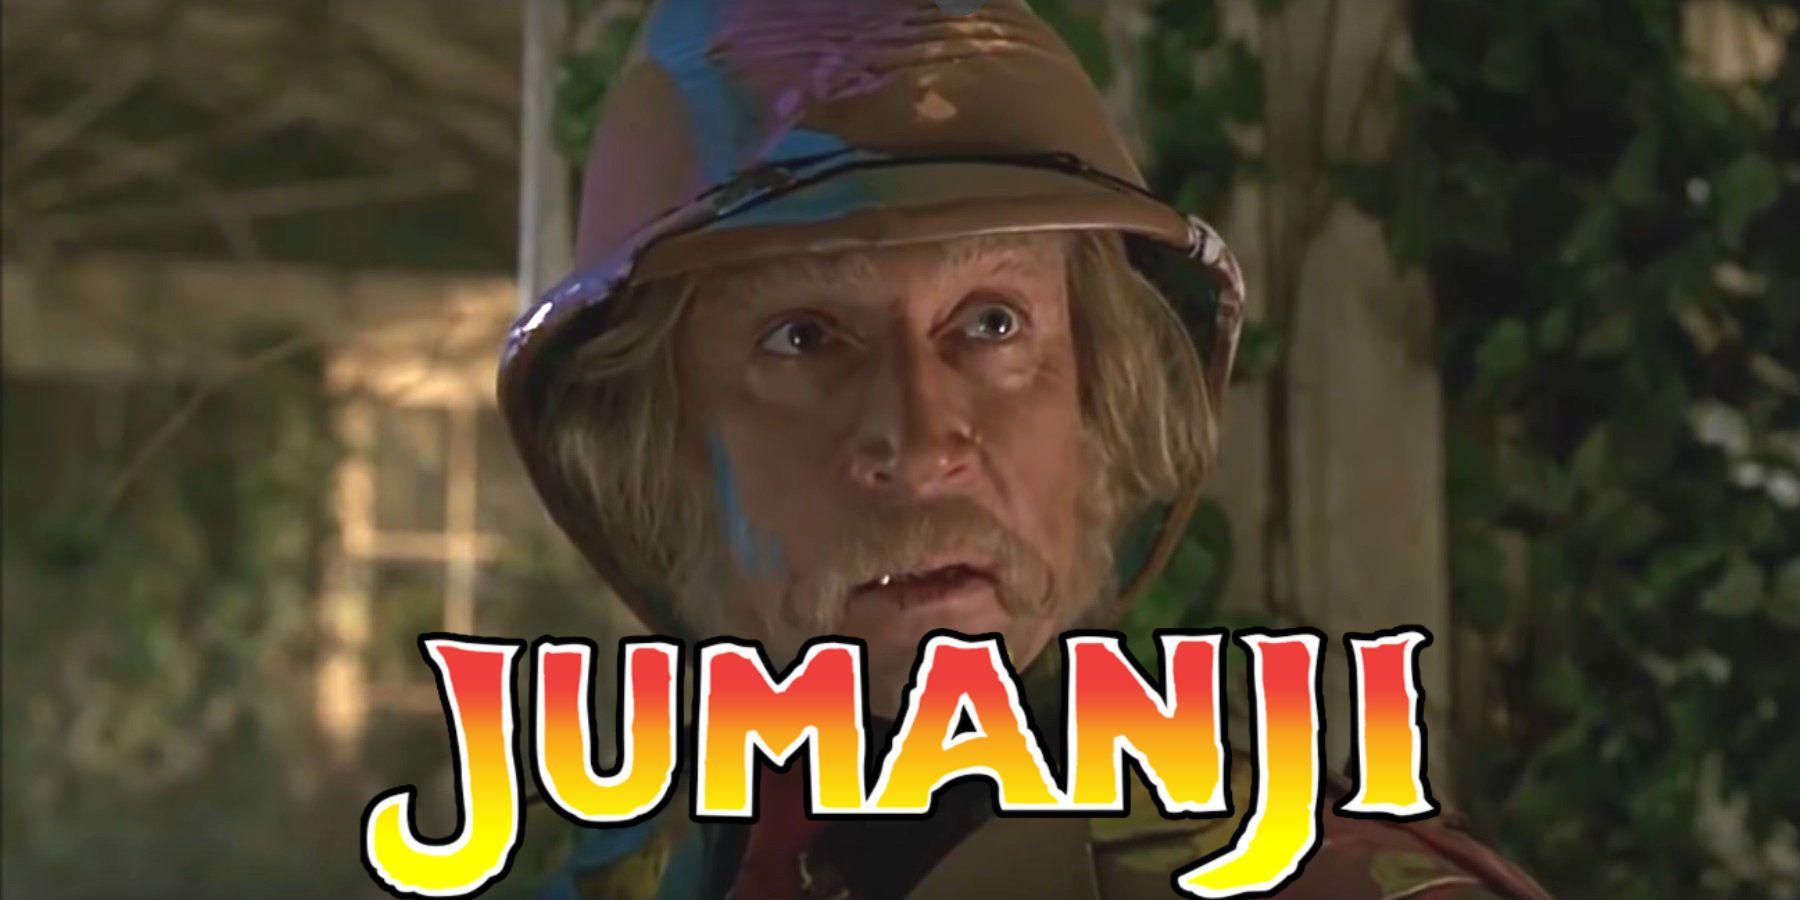 Jumanji: Why Van Pelt's Gun Disappears When The Game Ends